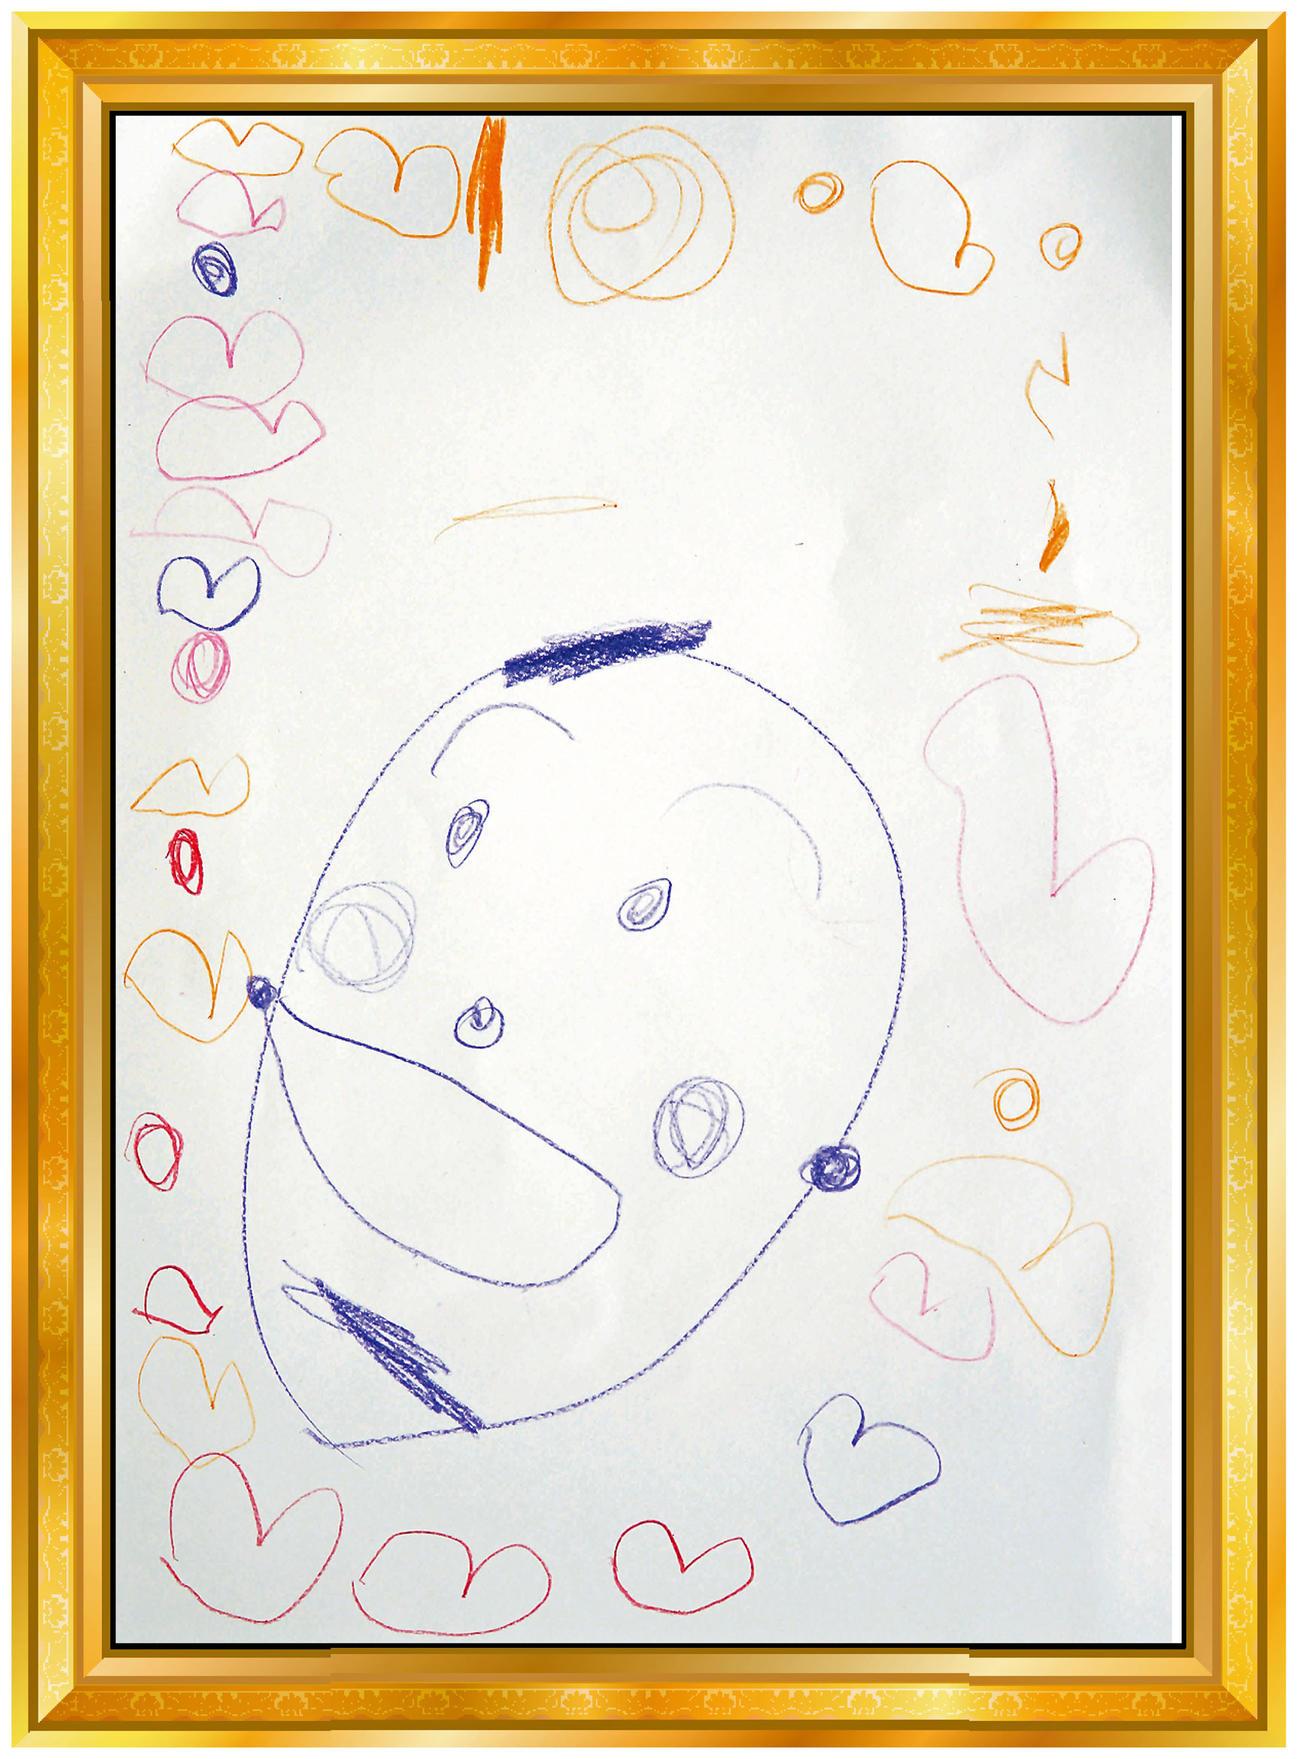 阪神岩貞3歳長女の似顔絵